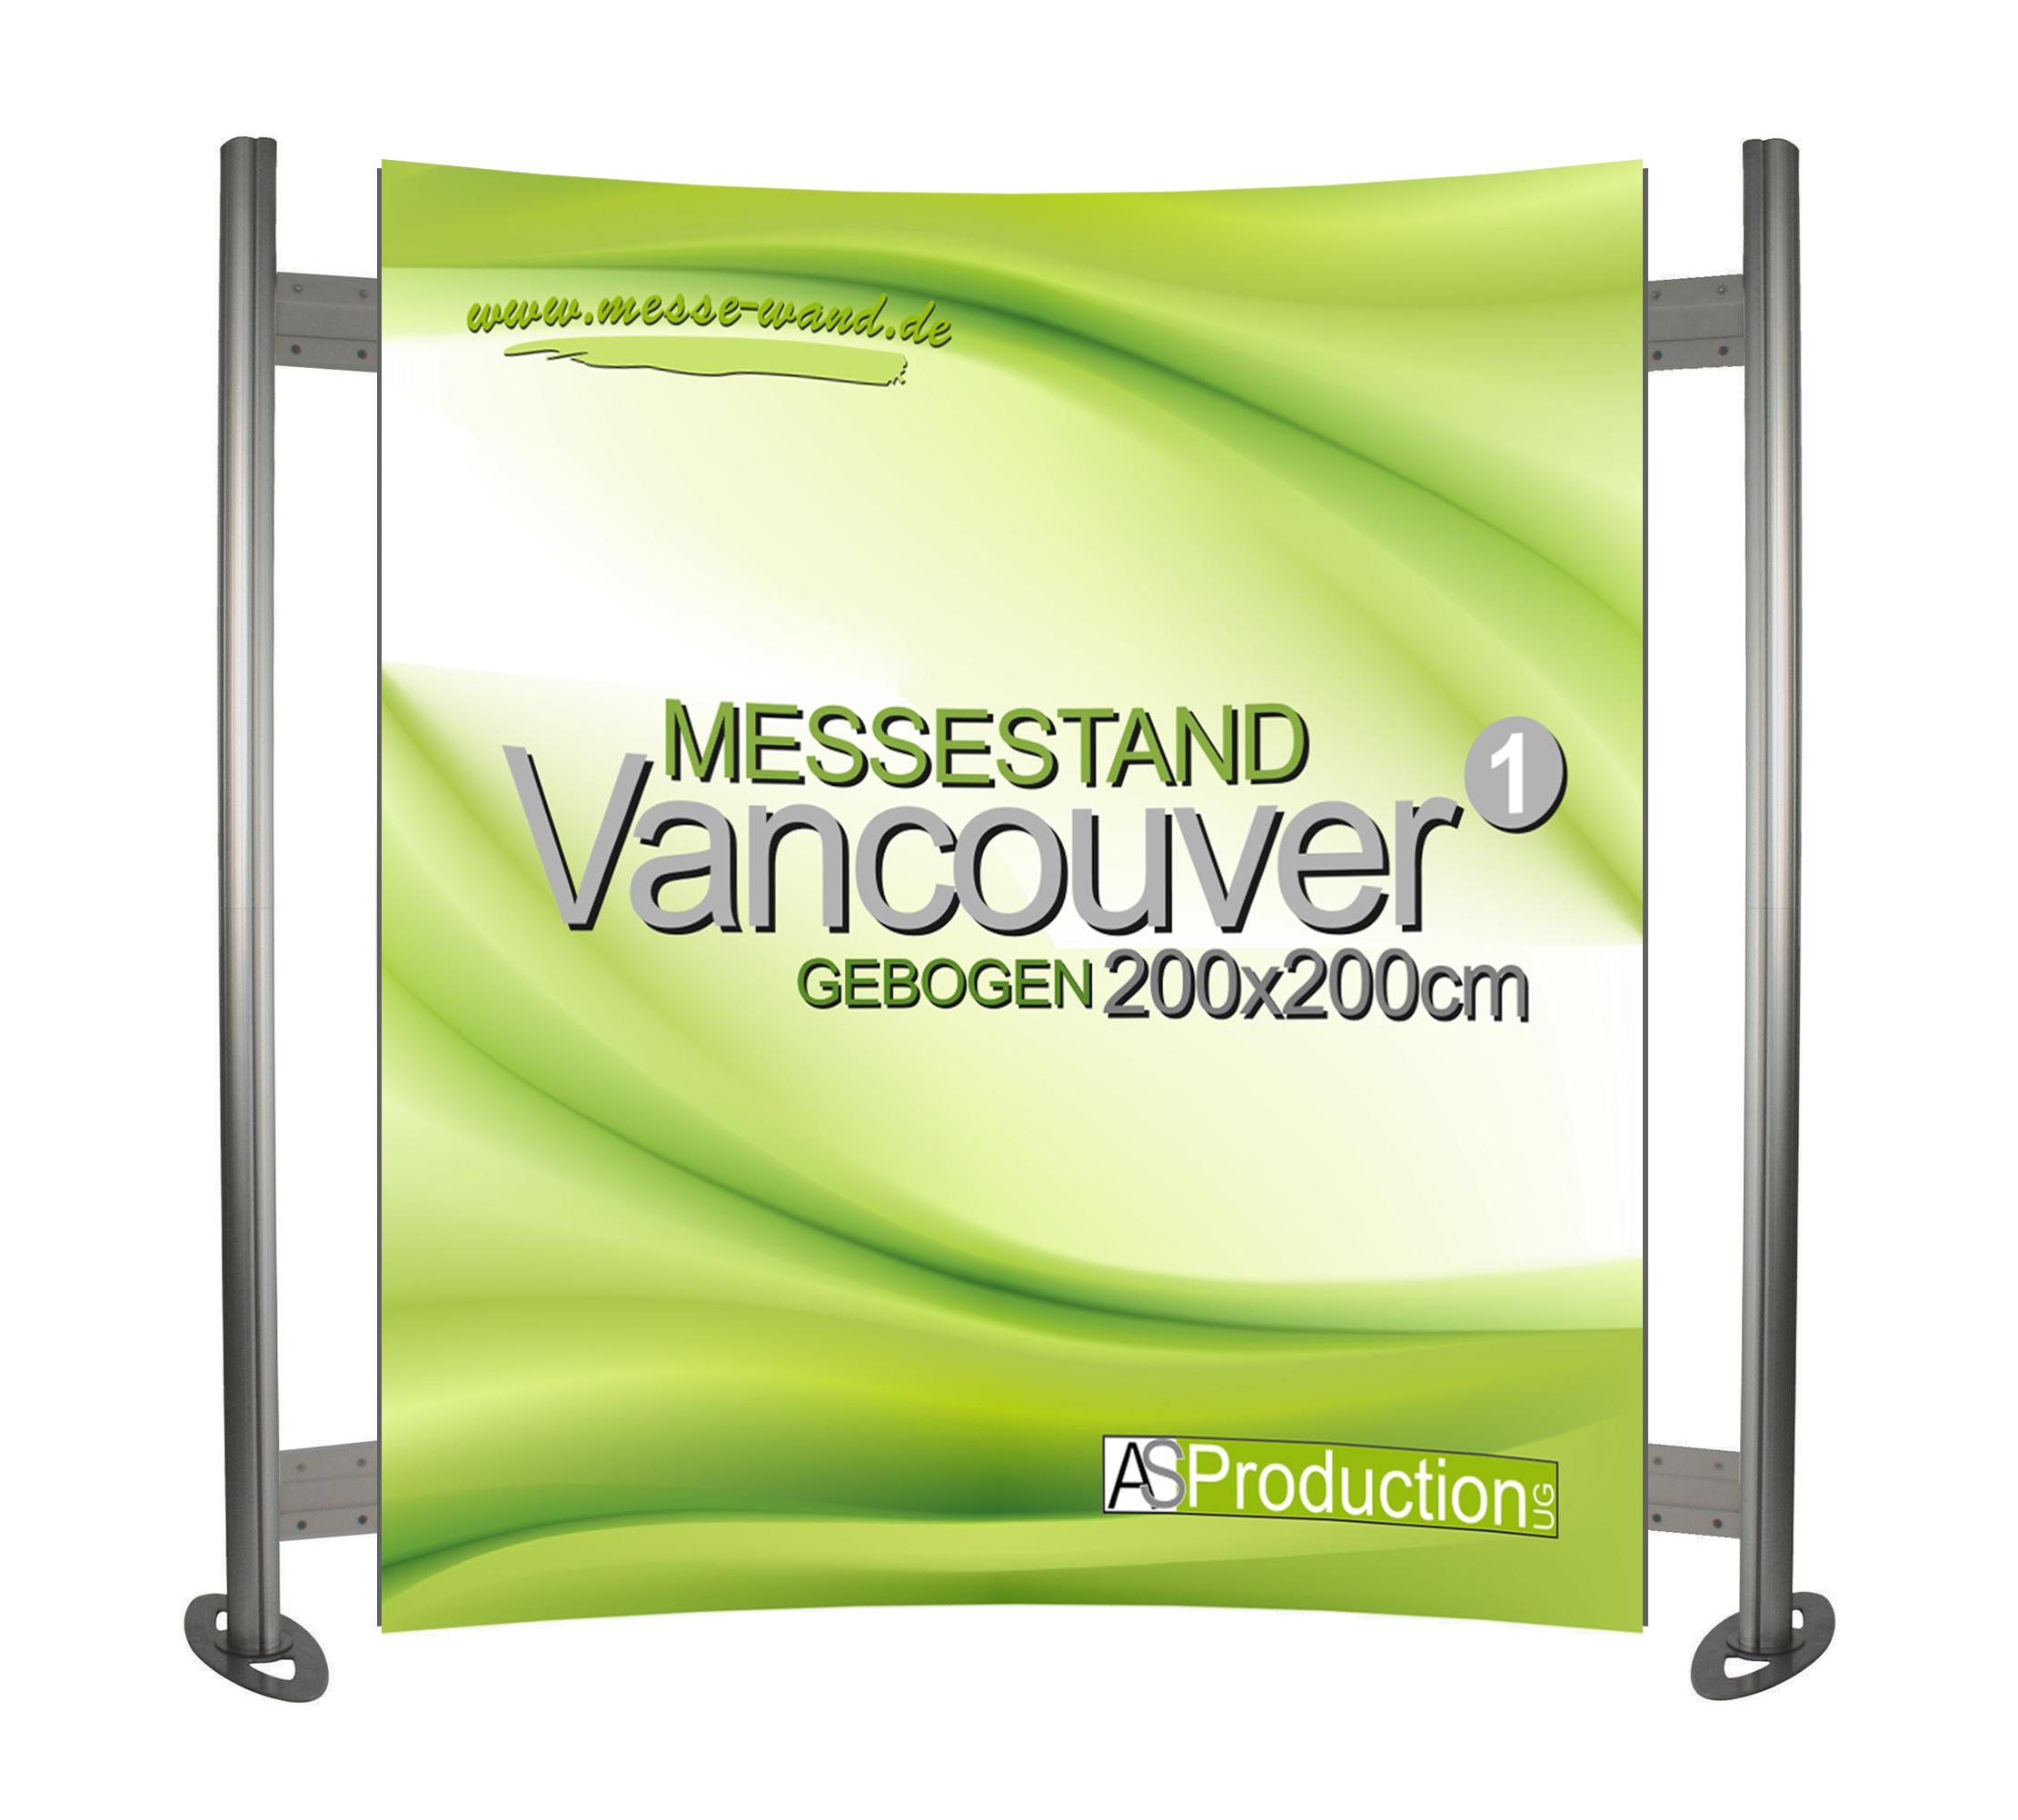 Messestand Promotionwand Vancouver  Gebogen 200 x 200 cm